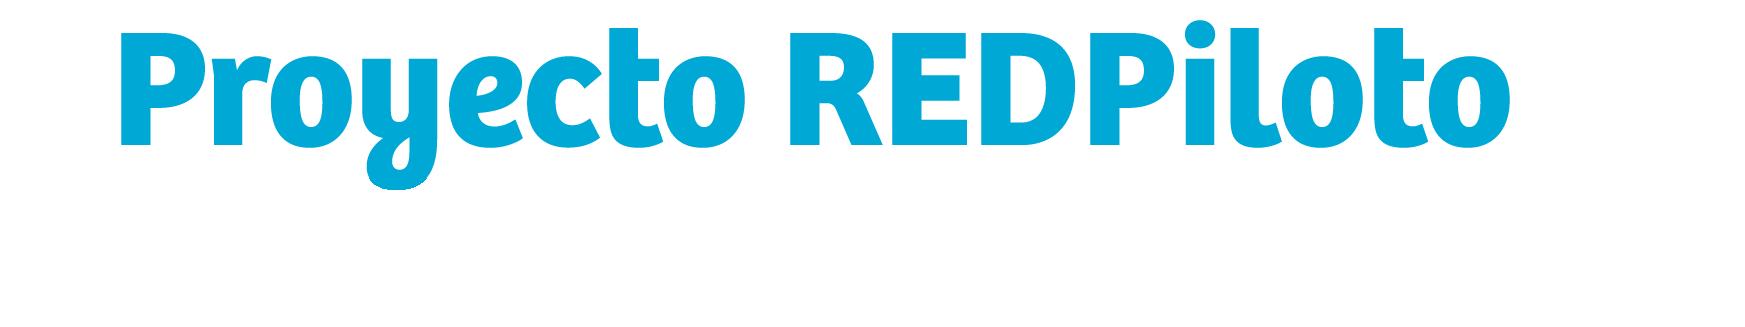 title-retopiloto-upc